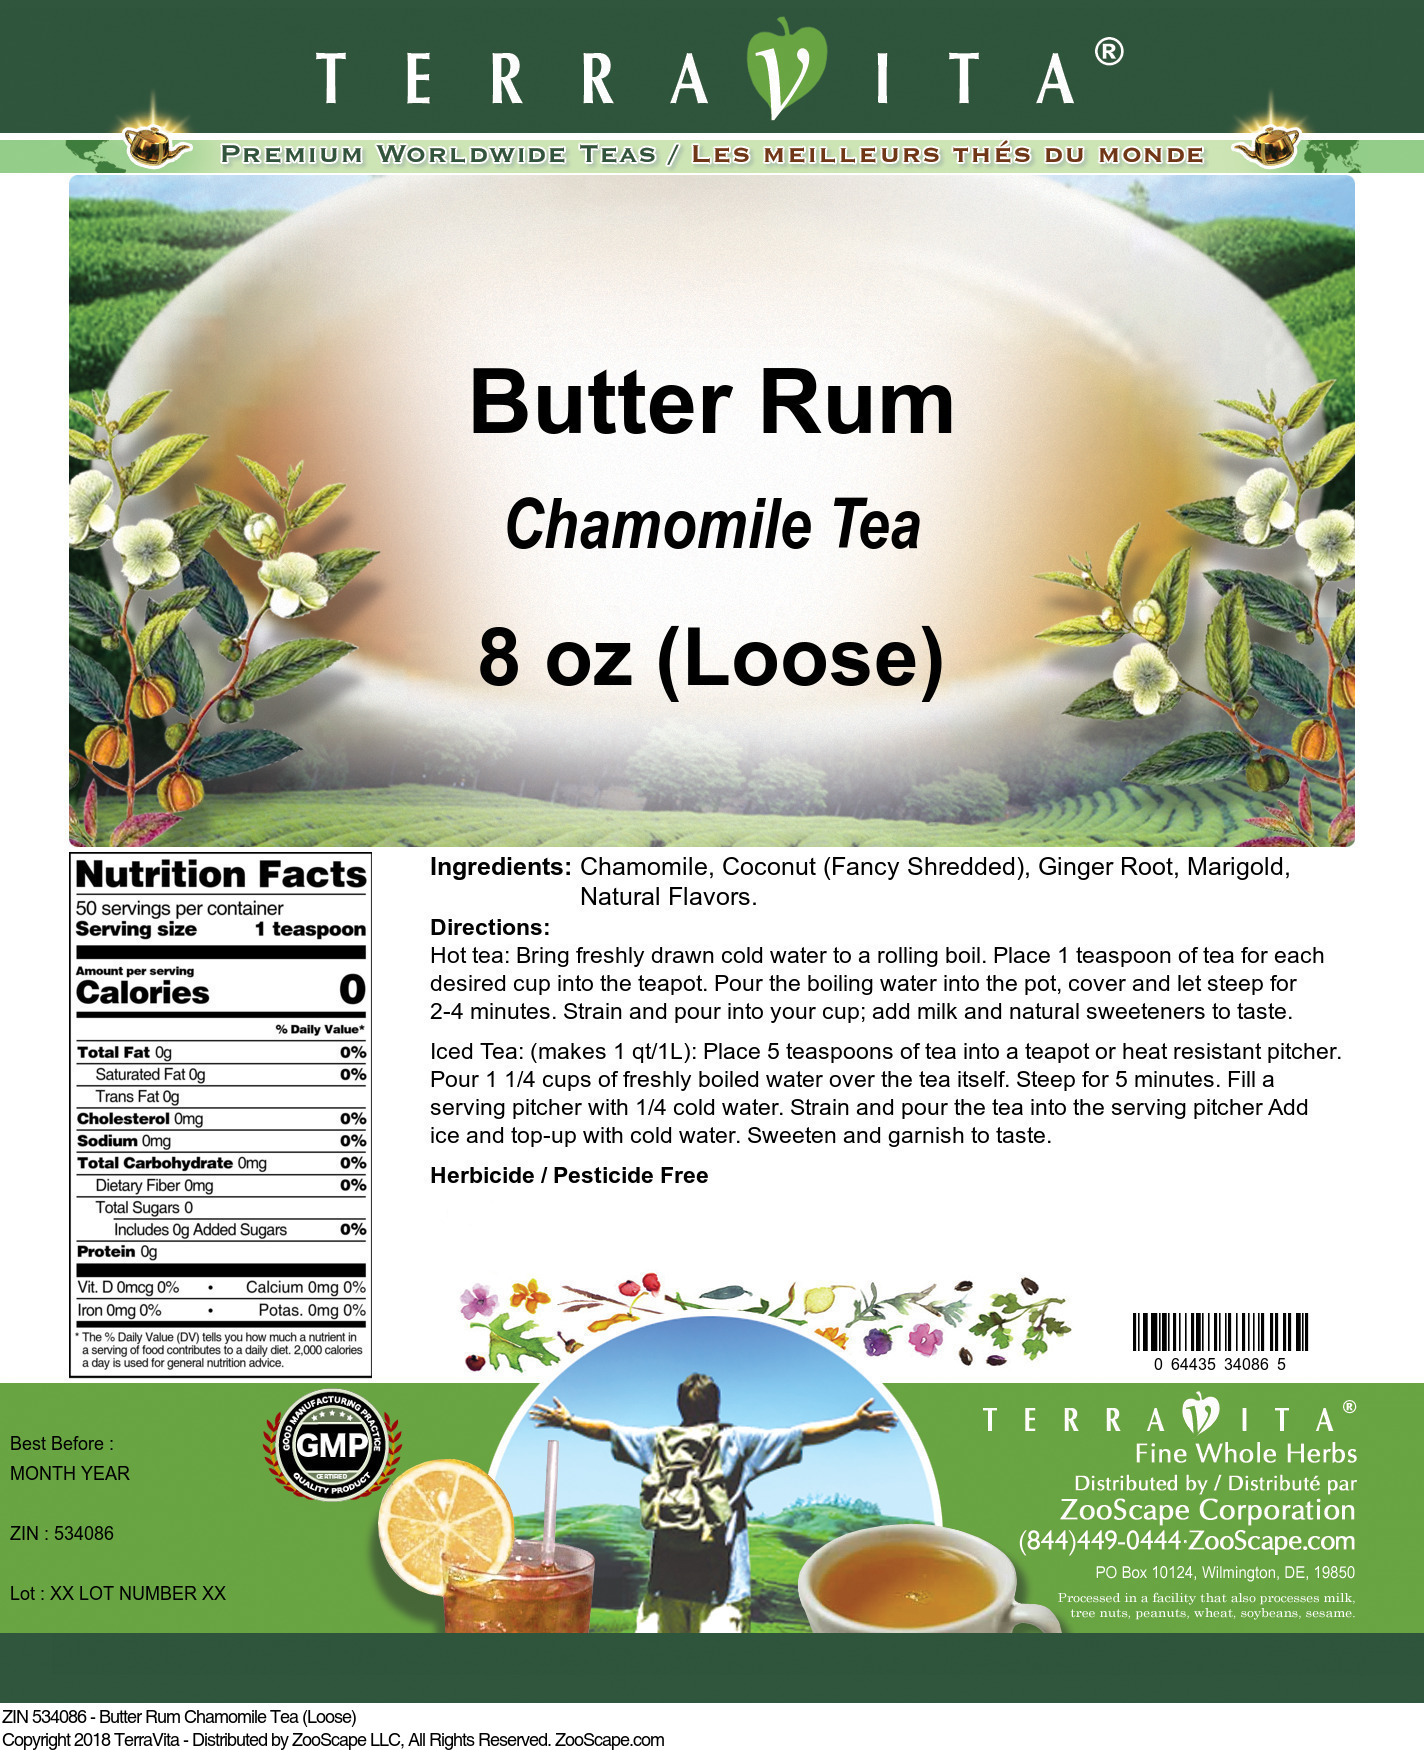 Butter Rum Chamomile Tea (Loose)